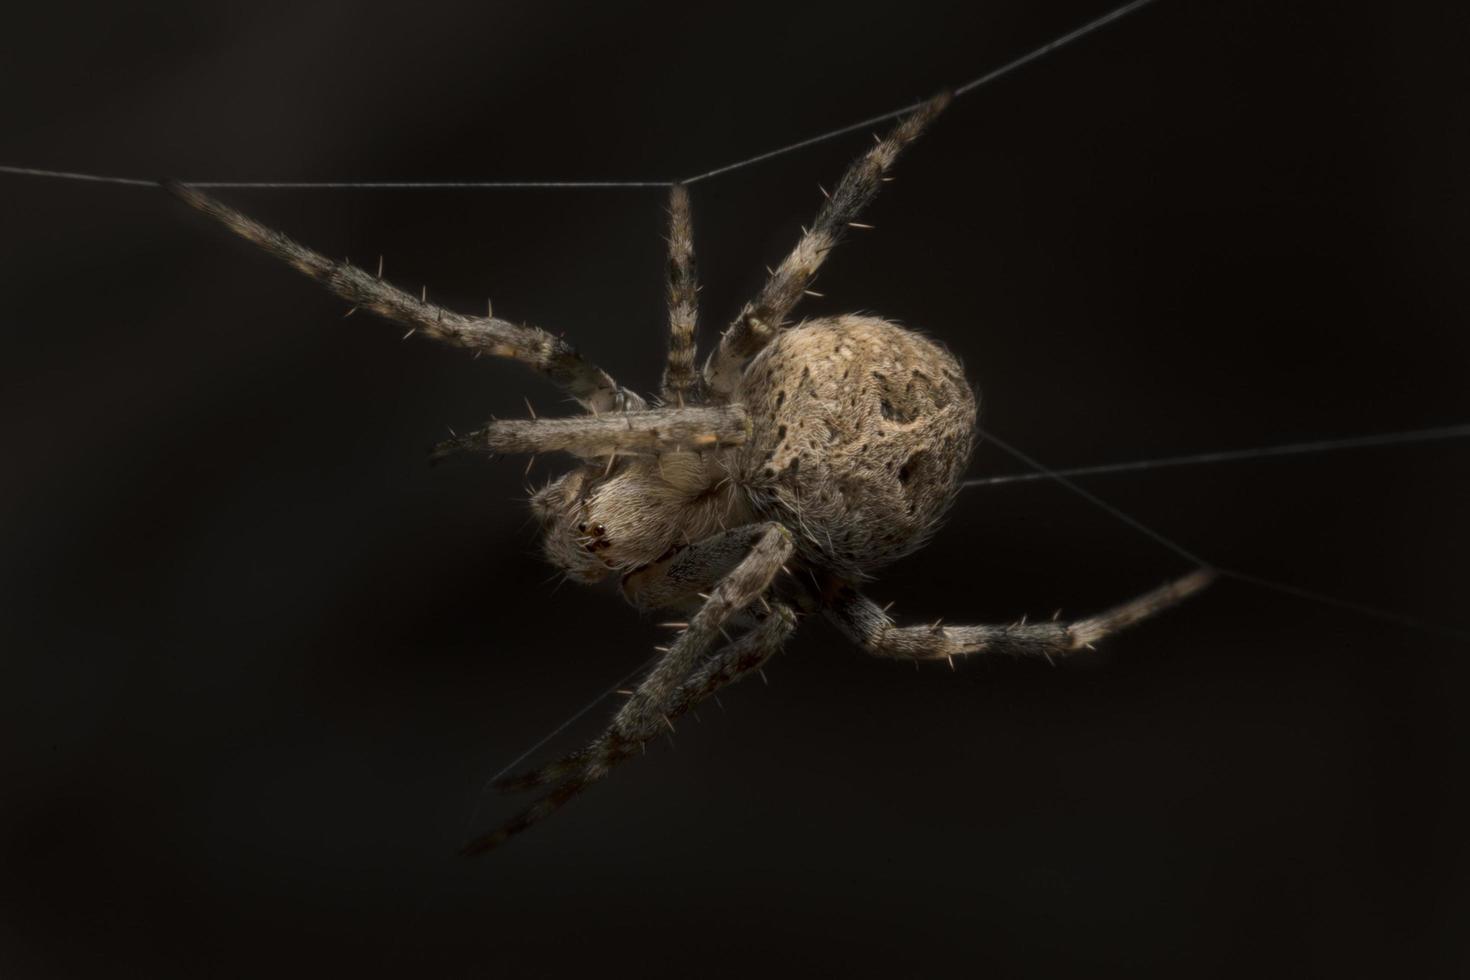 gros plan d'une araignée de jardin photo